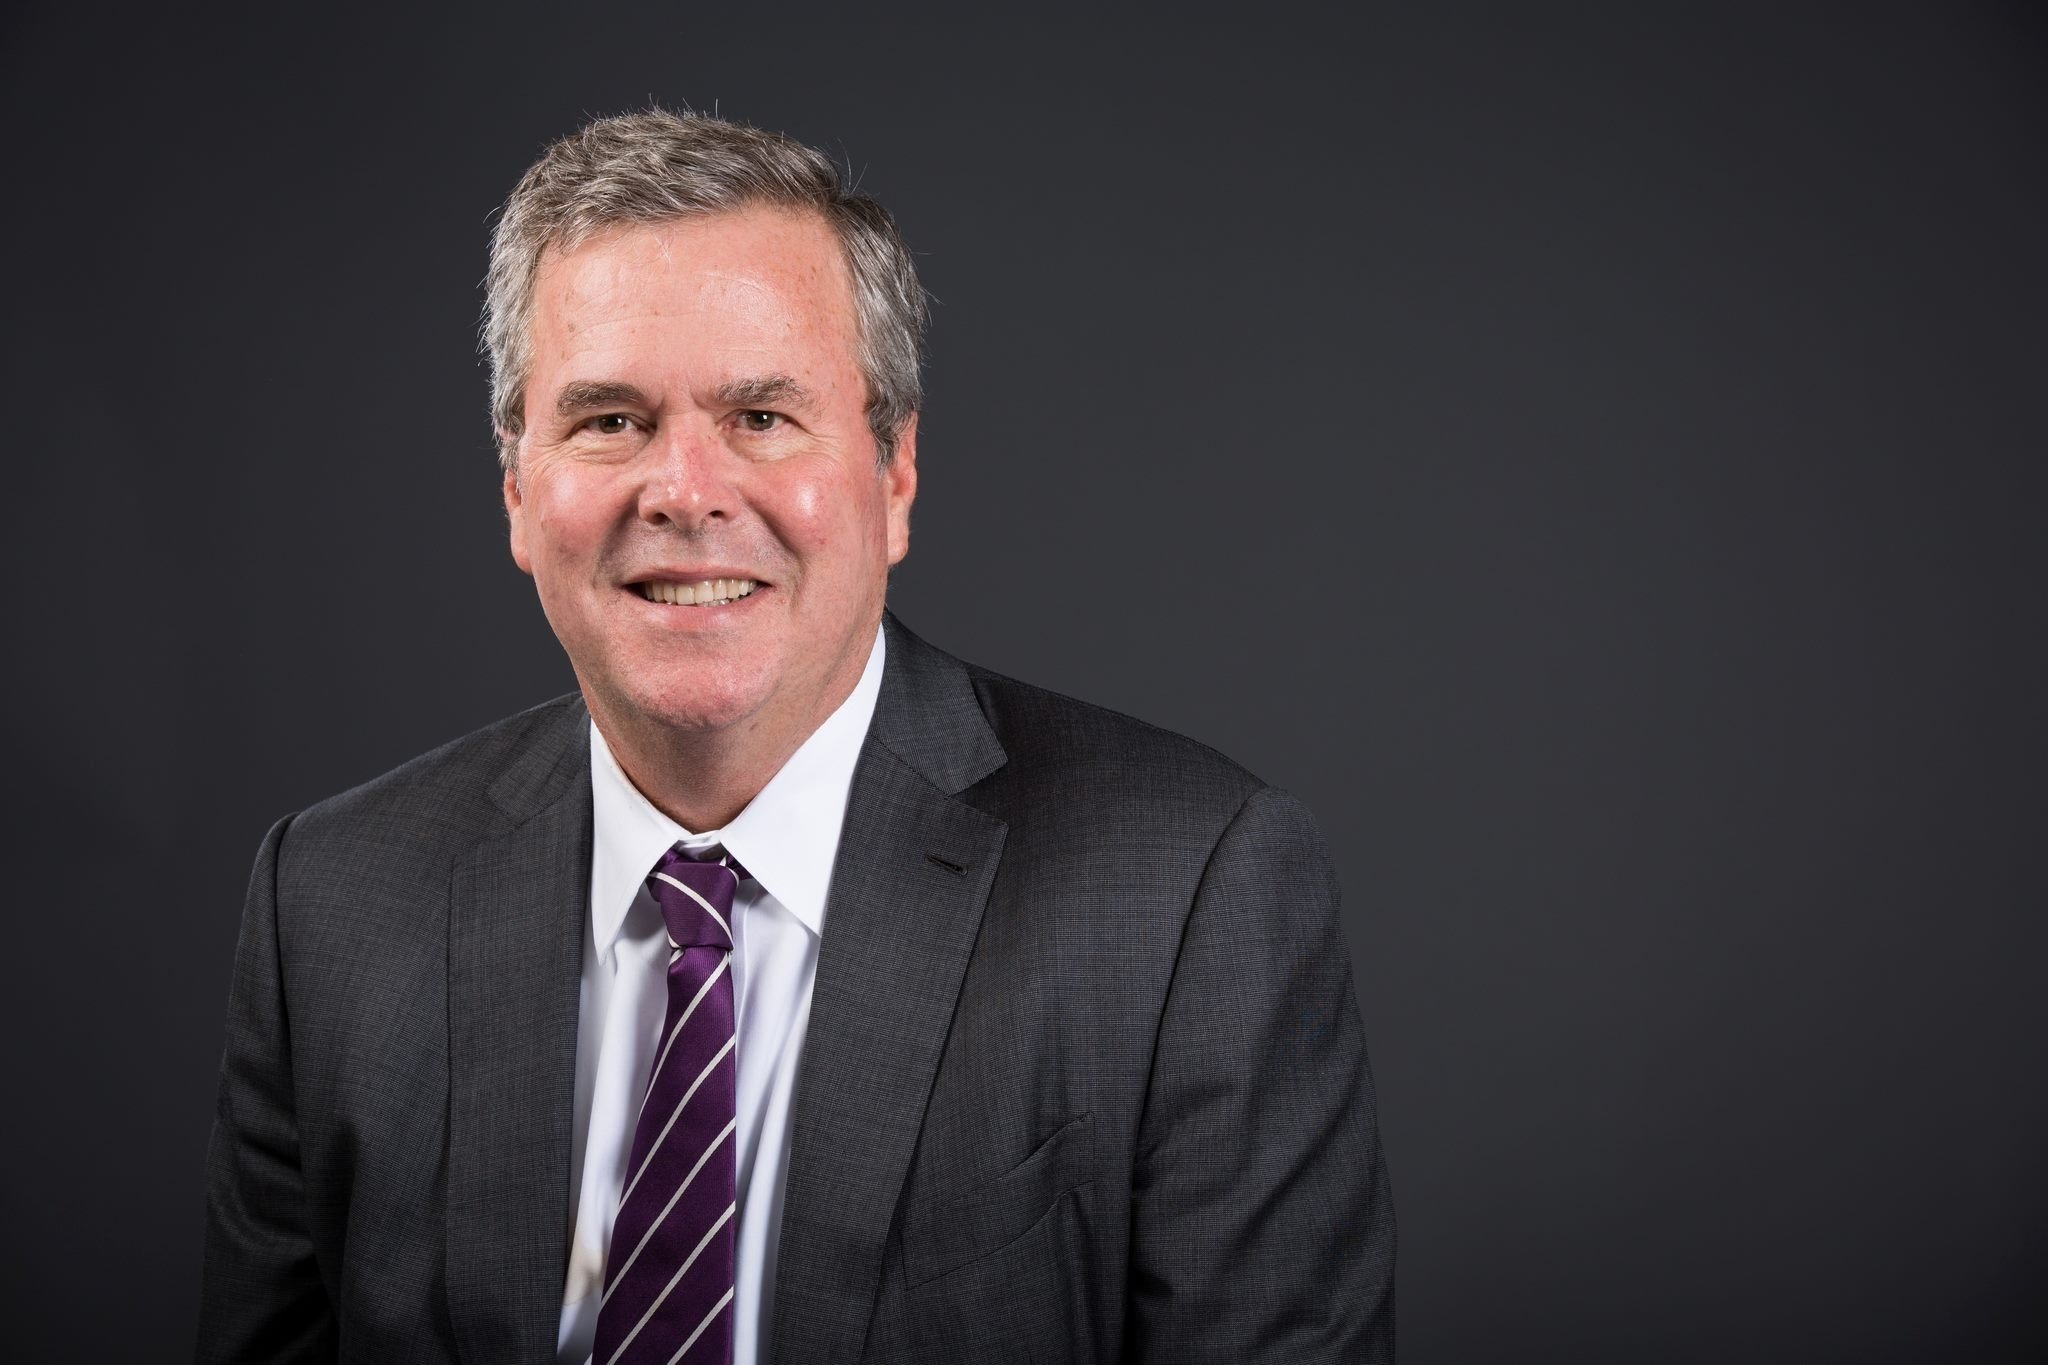 Former Gov. Jeb Bush endorses David Jolly for Congress